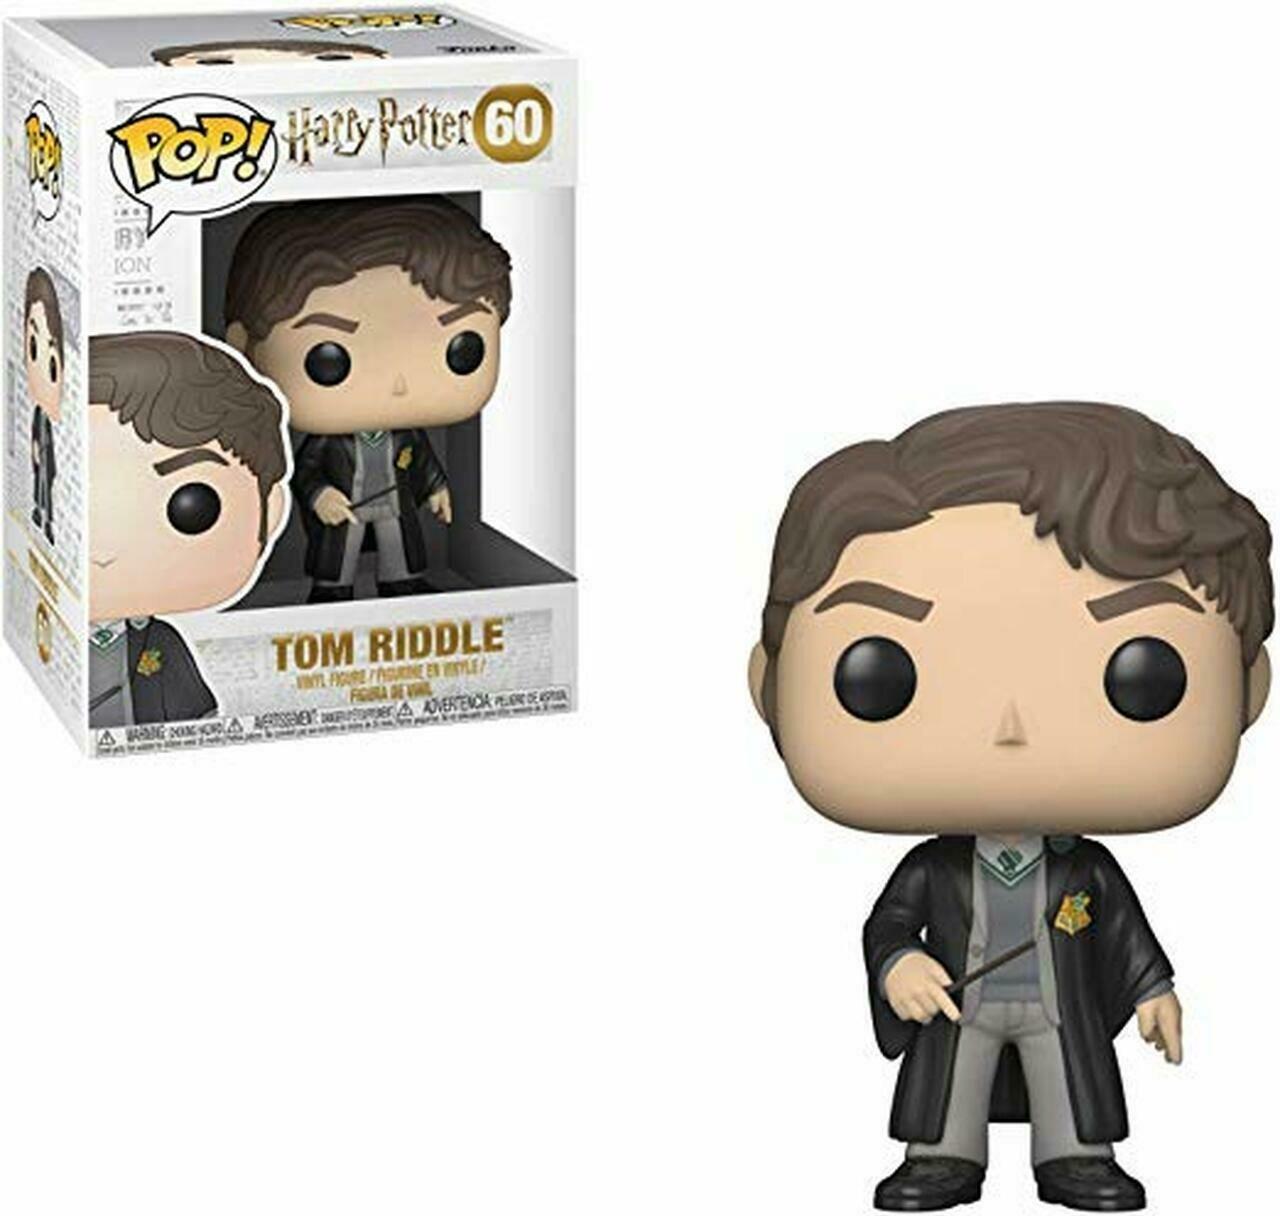 Funko POP! Harry Potter - Tom Riddle No: 60